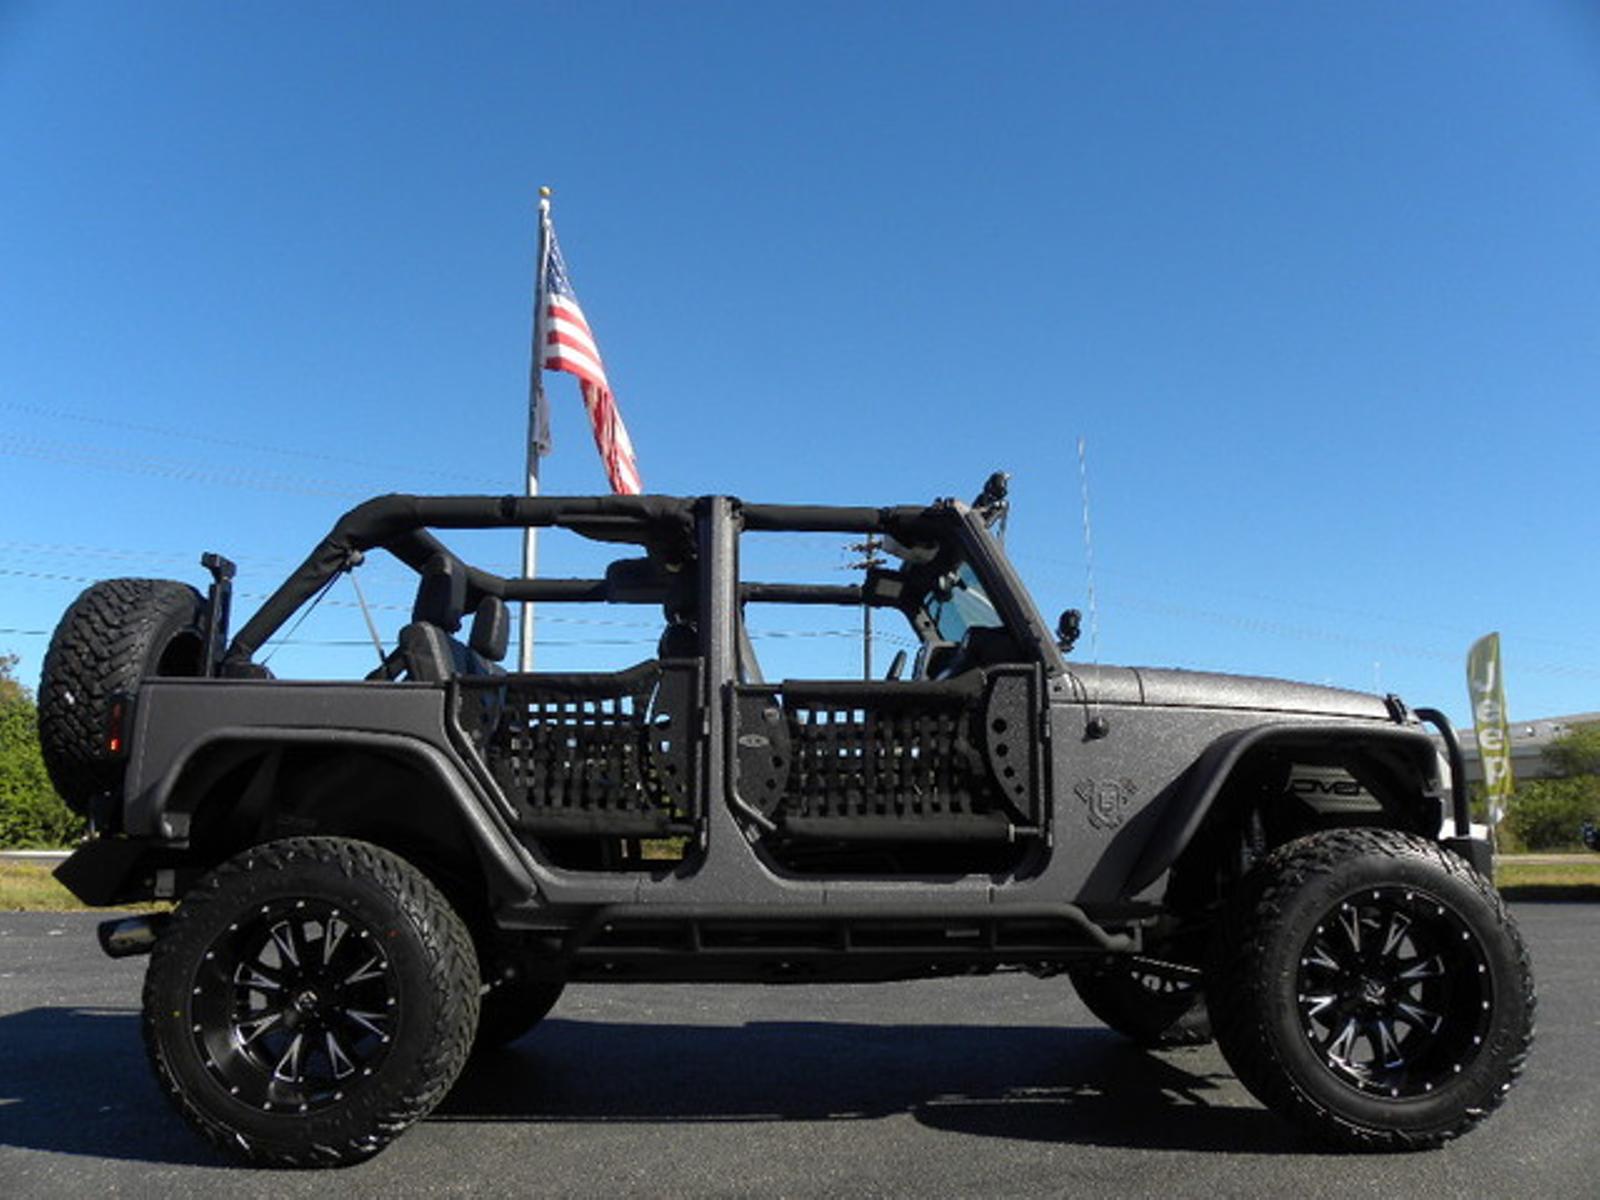 2016 jeep wrangler unlimited rhino rubiconfueldv8smittyfoxfab four florida bayshore automotive. Black Bedroom Furniture Sets. Home Design Ideas